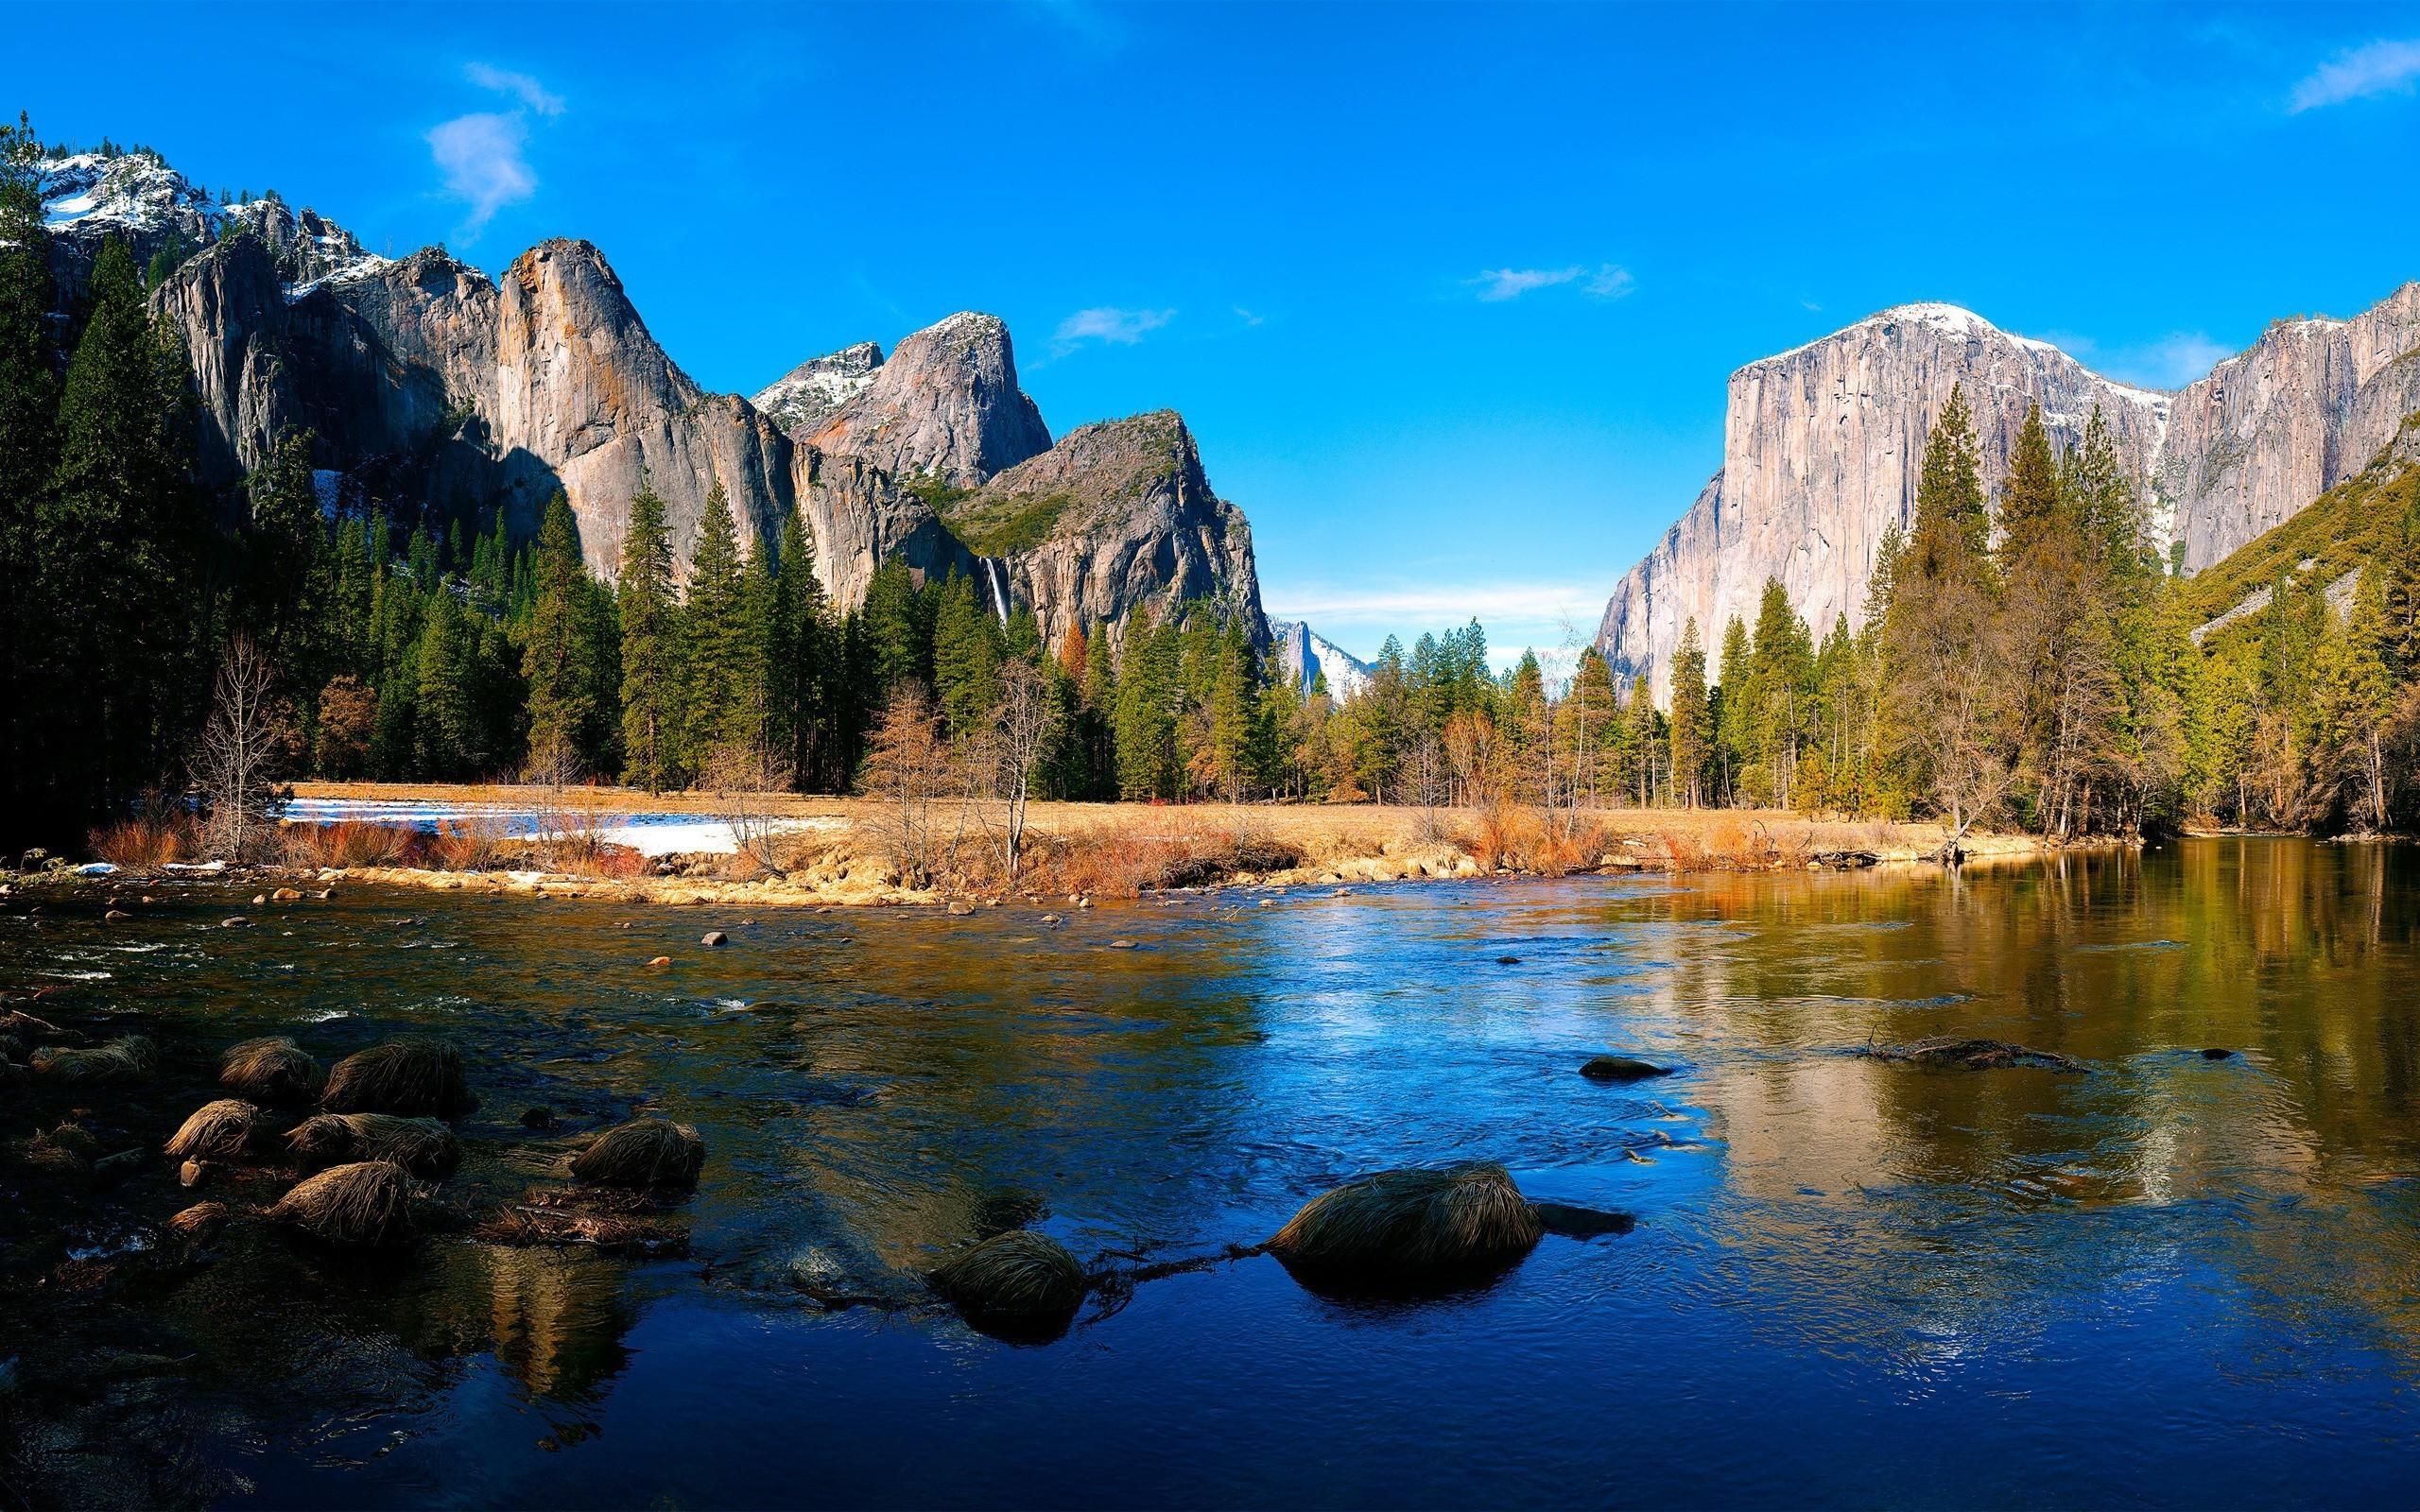 Hd wallpaper yosemite - Yosemite Valley Wallpaper Apple Wallpaper Yosemite Apple 8k Pics